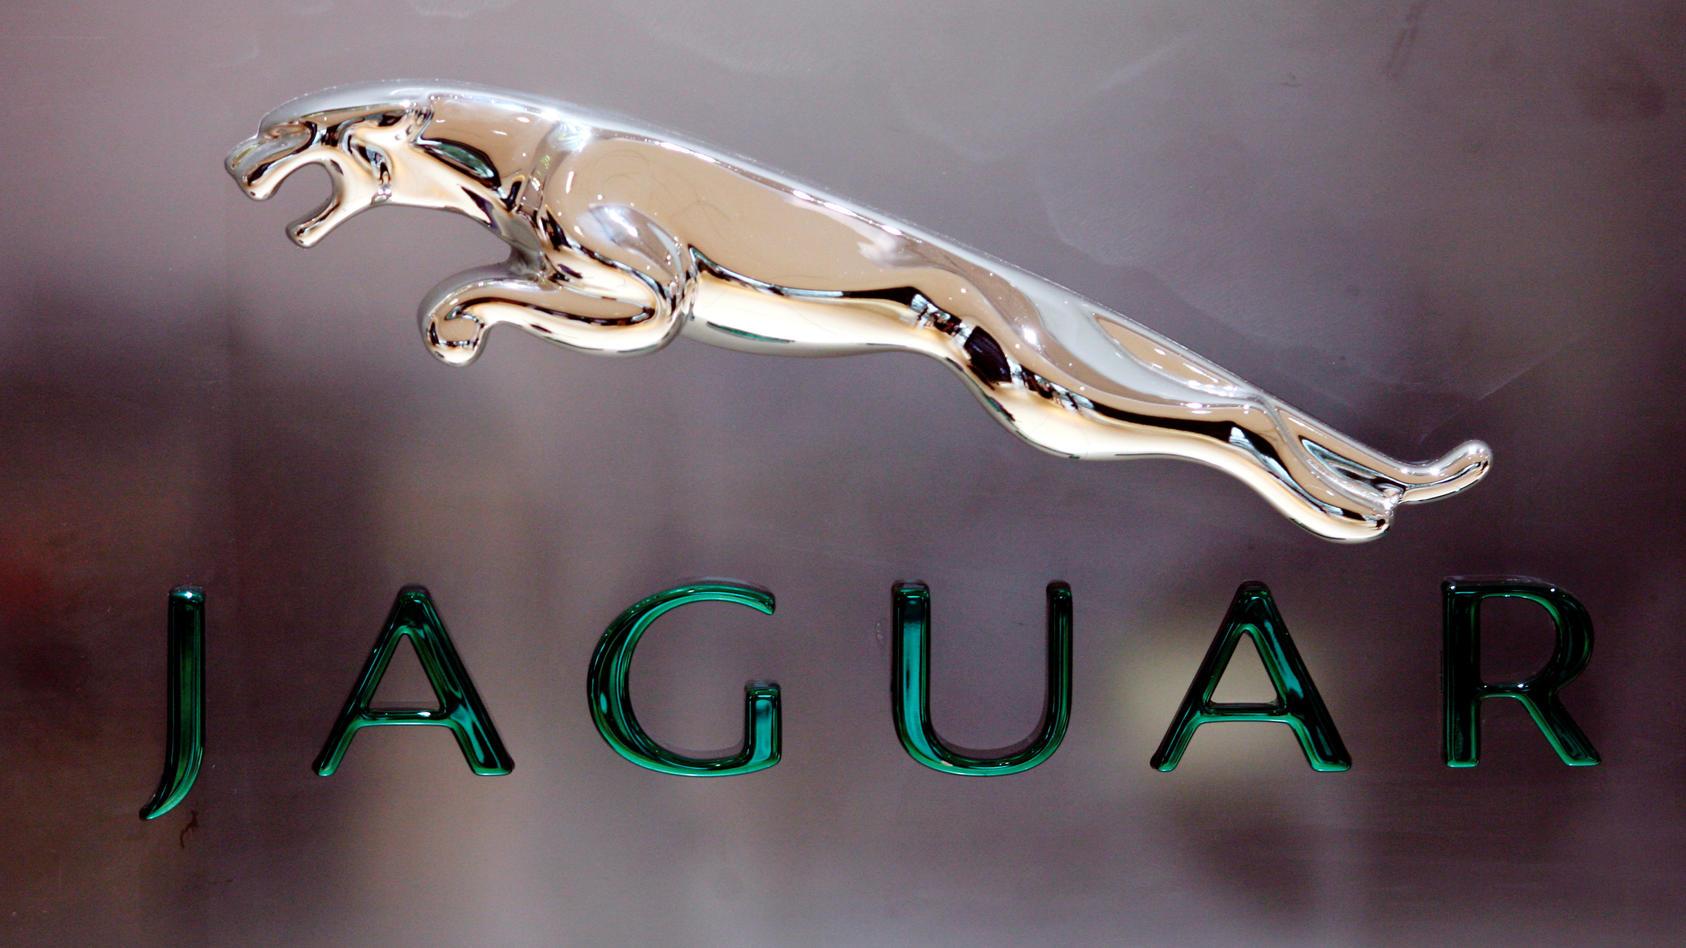 FILE PHOTO: The Jaguar logo is pictured at a Jaguar Landrover showroom in Mumbai